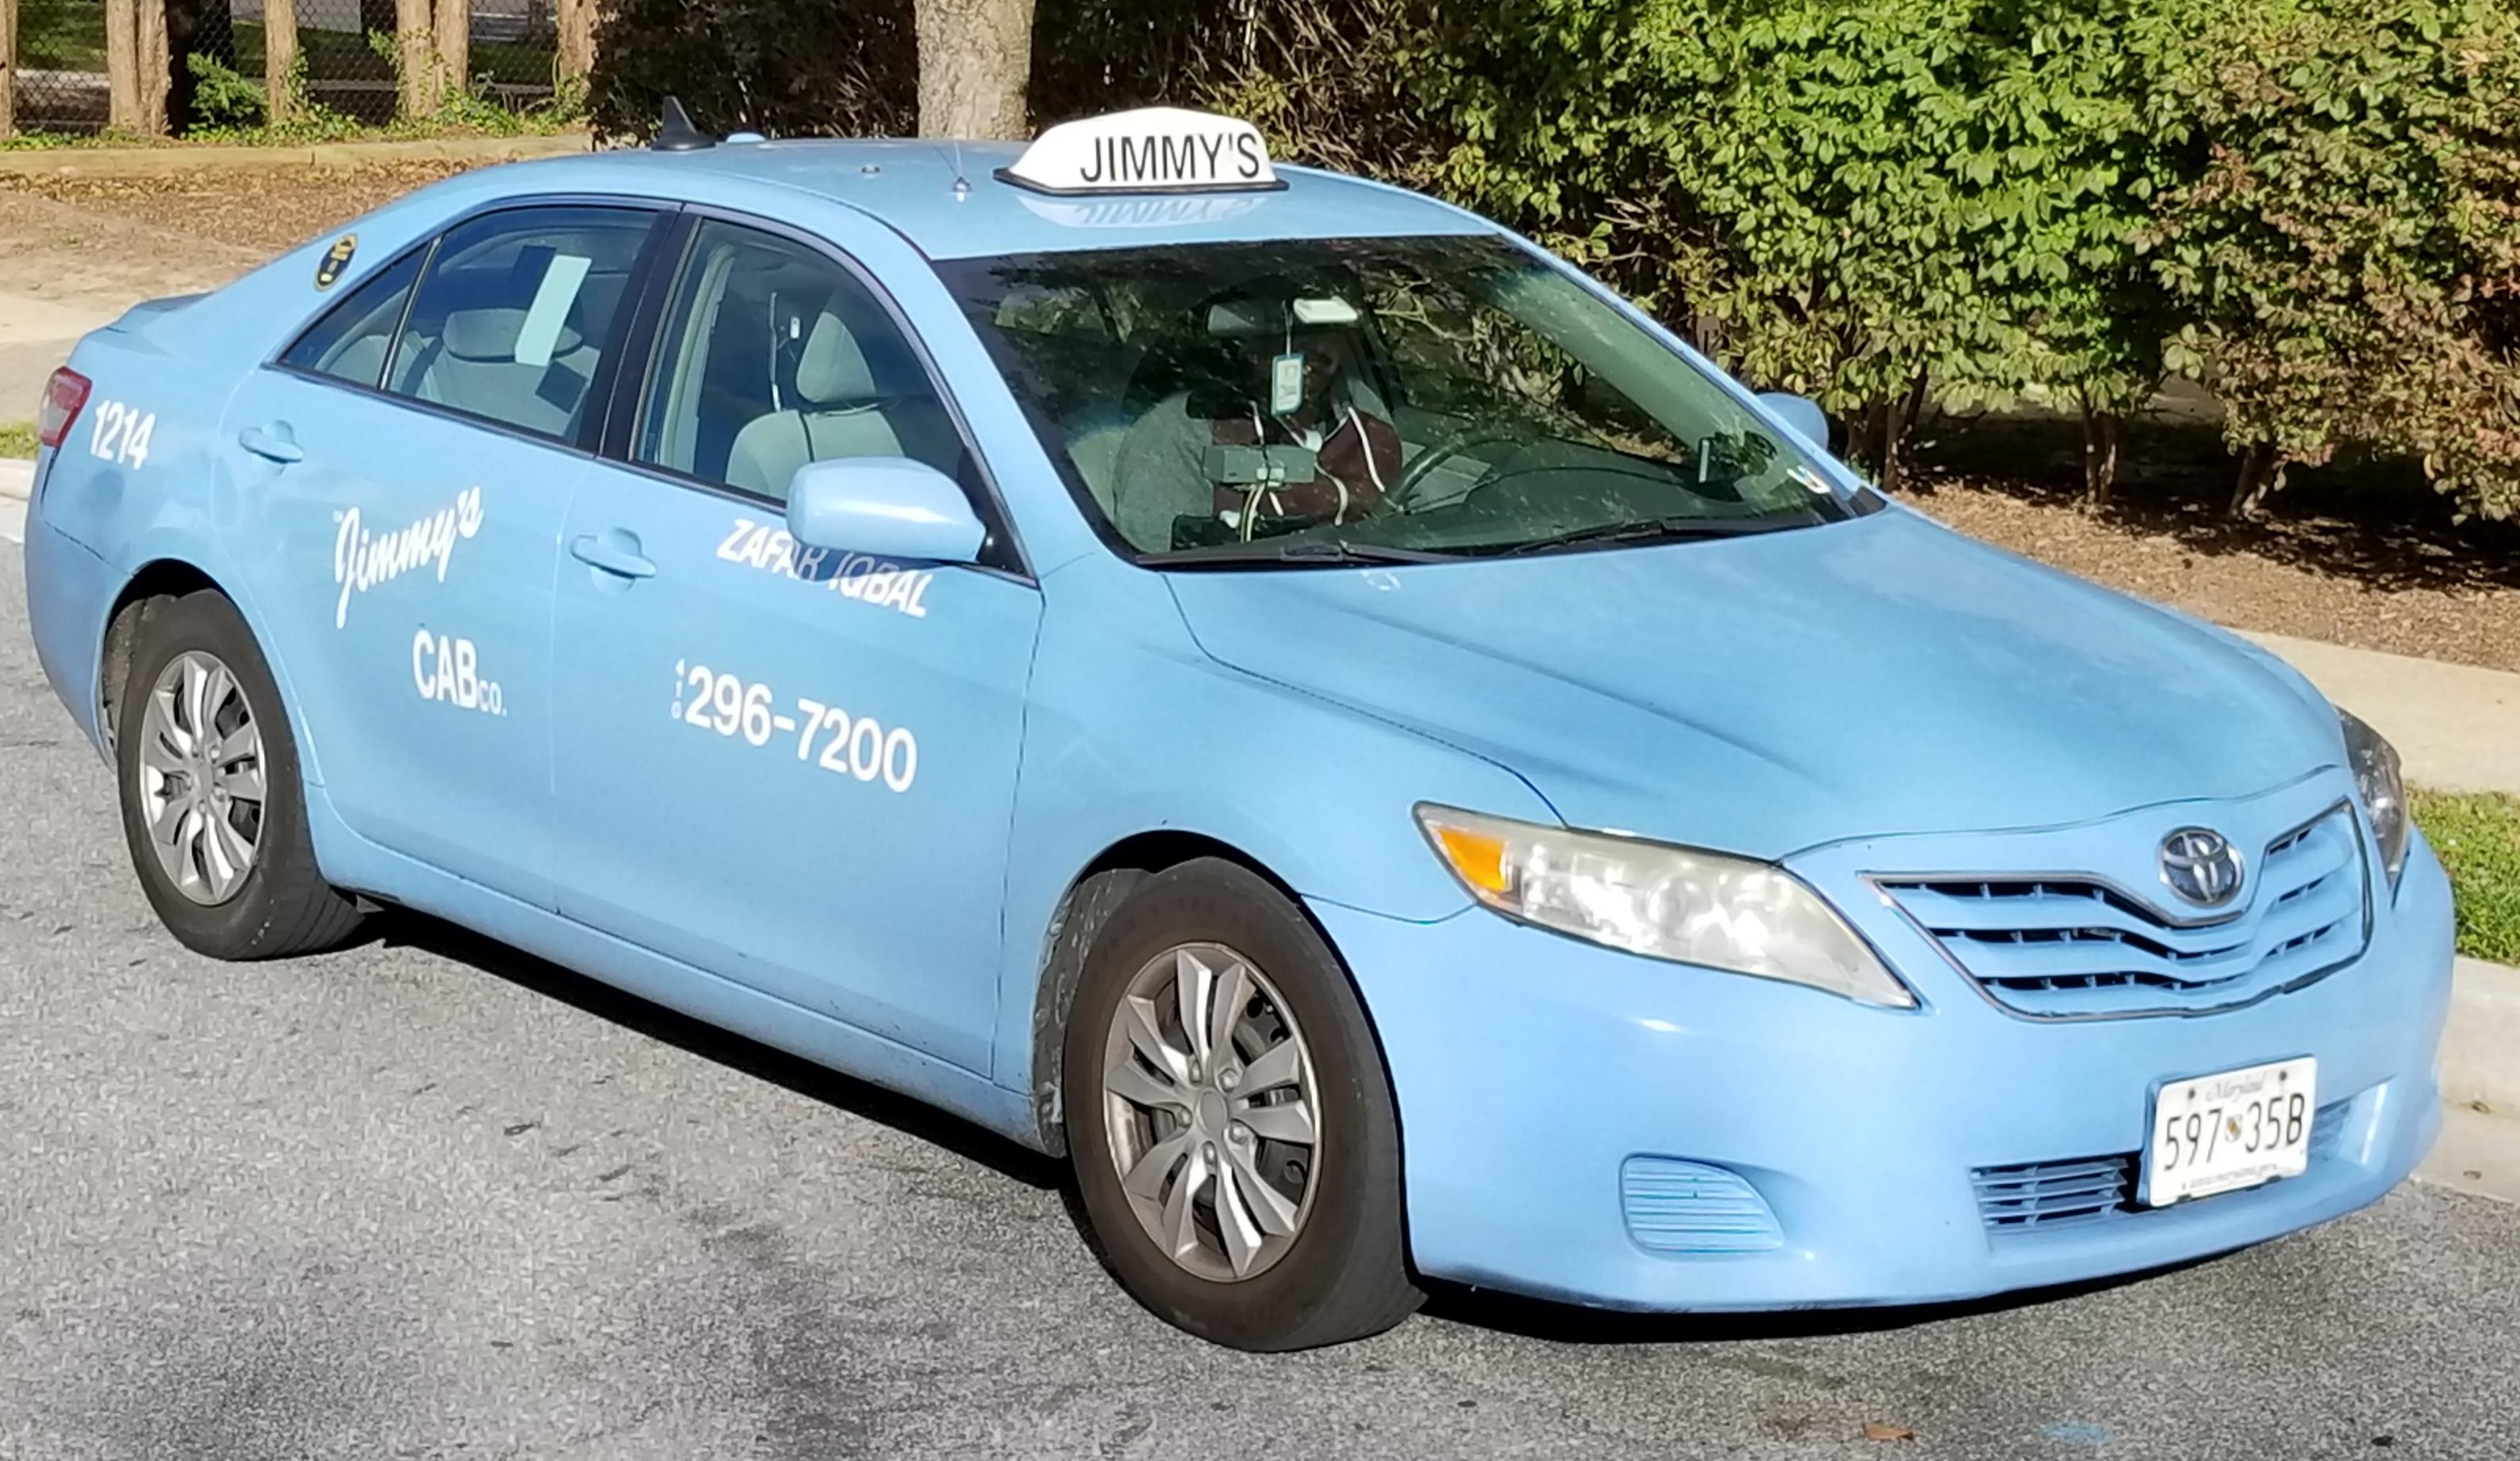 Jimmy's Cab Co image 1